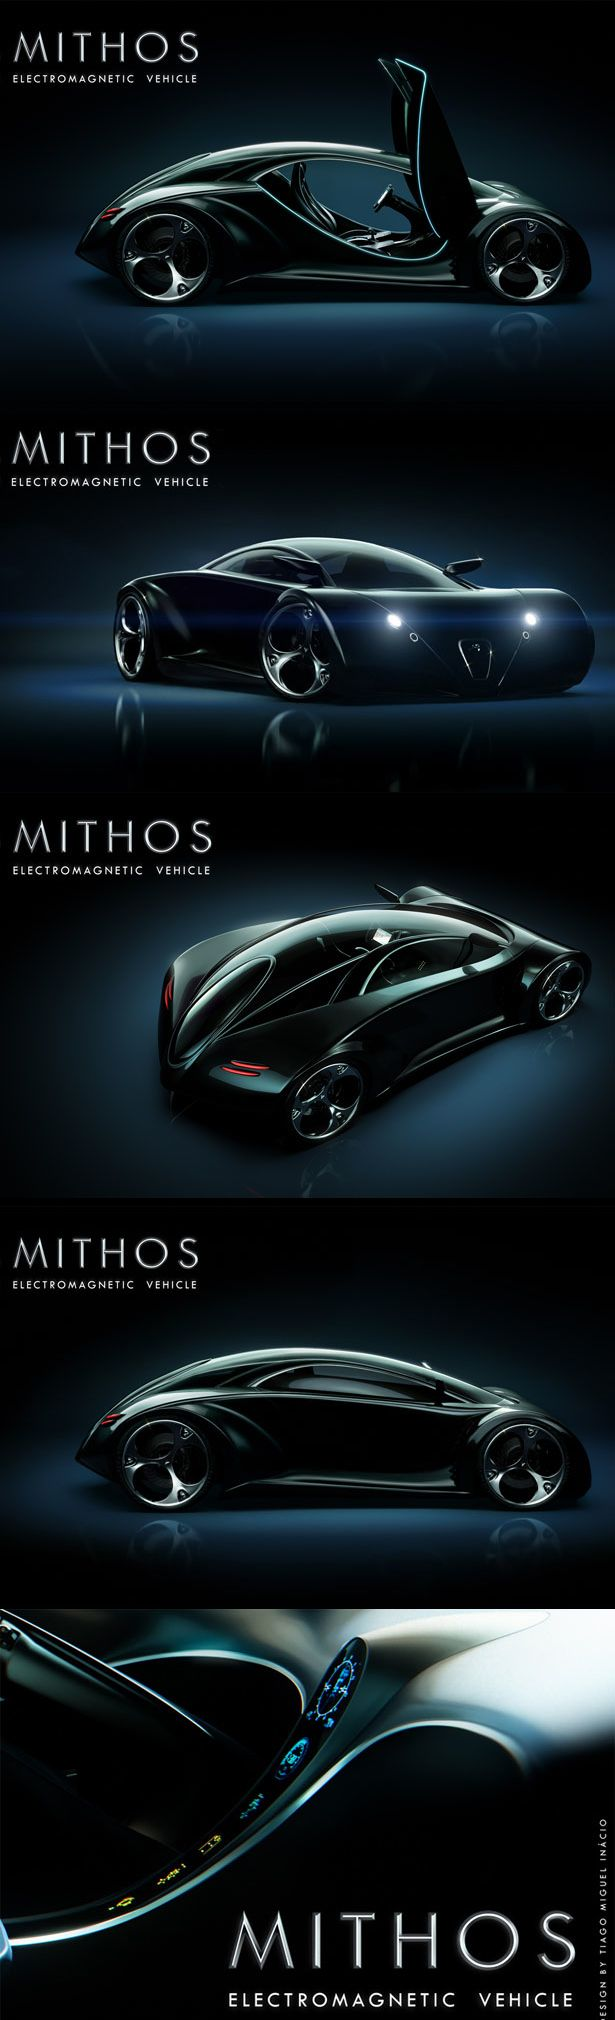 Futuristic mithos electromagnetic vehicle features crash resistant body and quantum boost technology batmobile